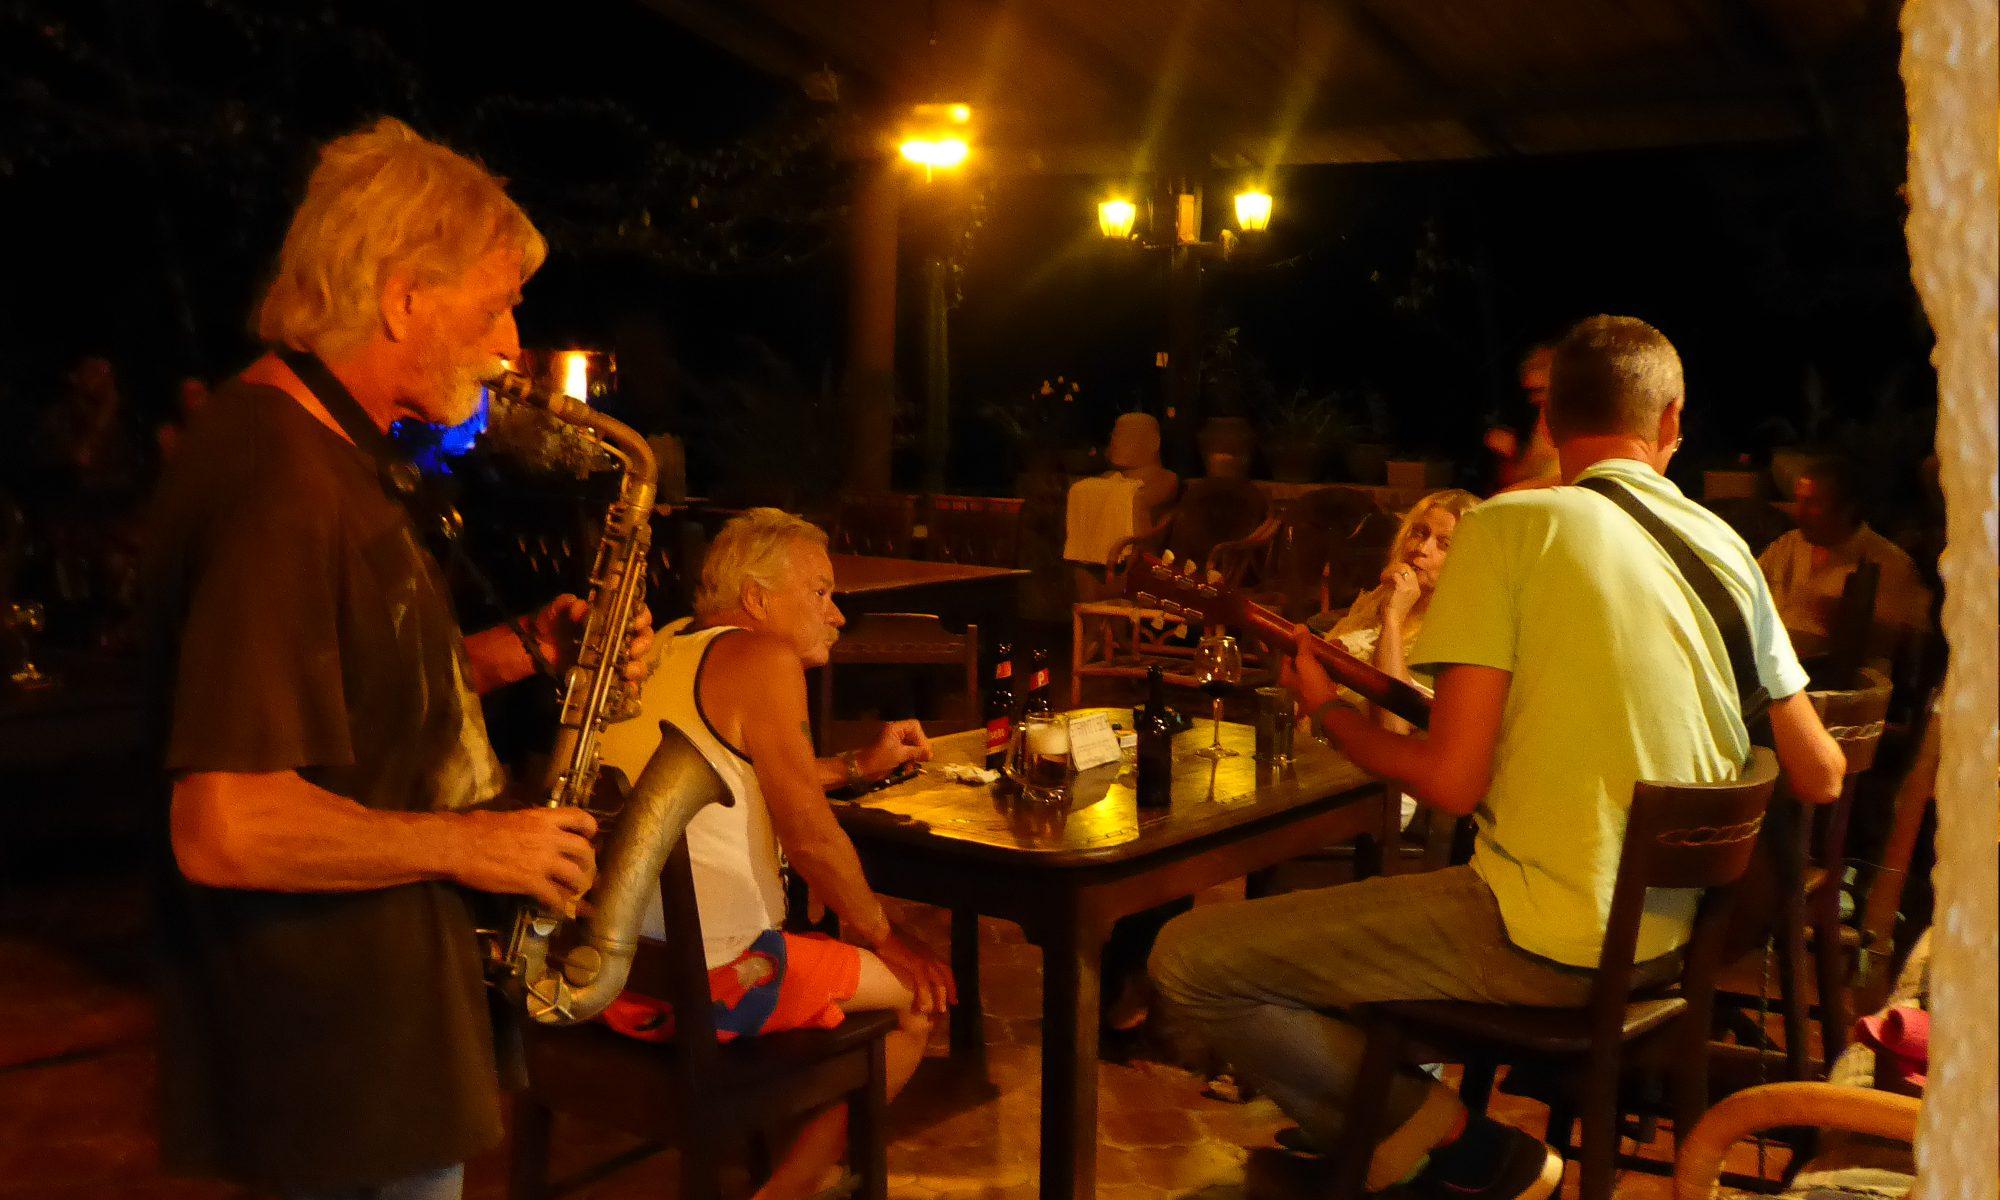 Music Costa Rica